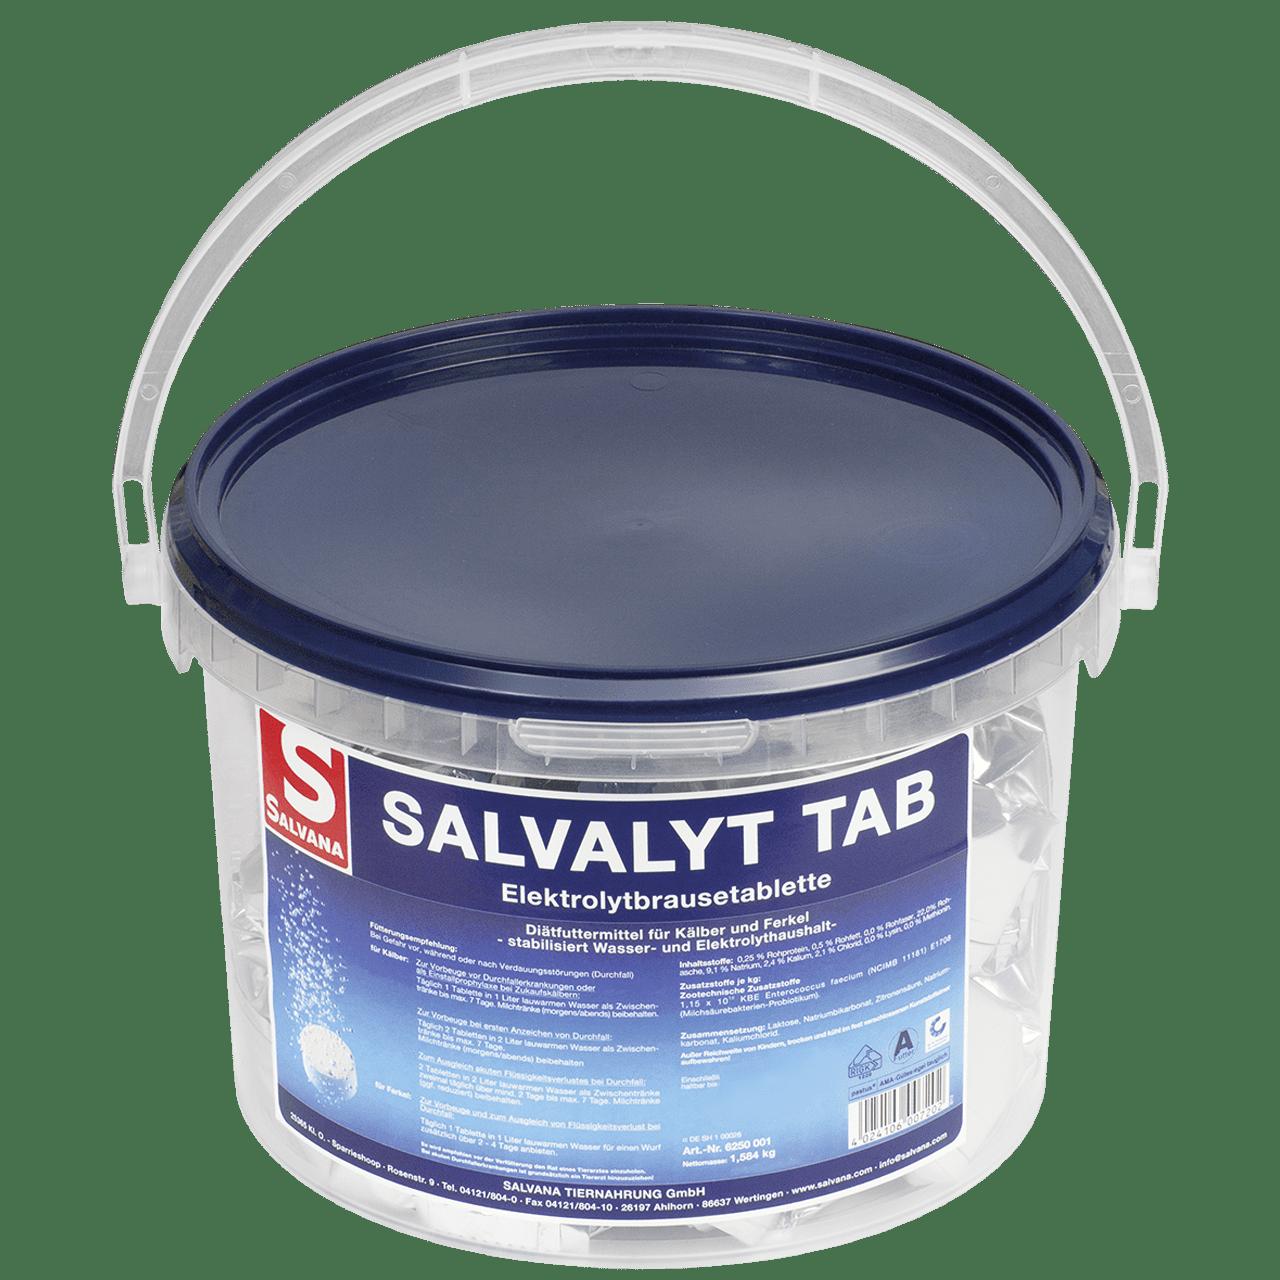 SALVALYT TAB